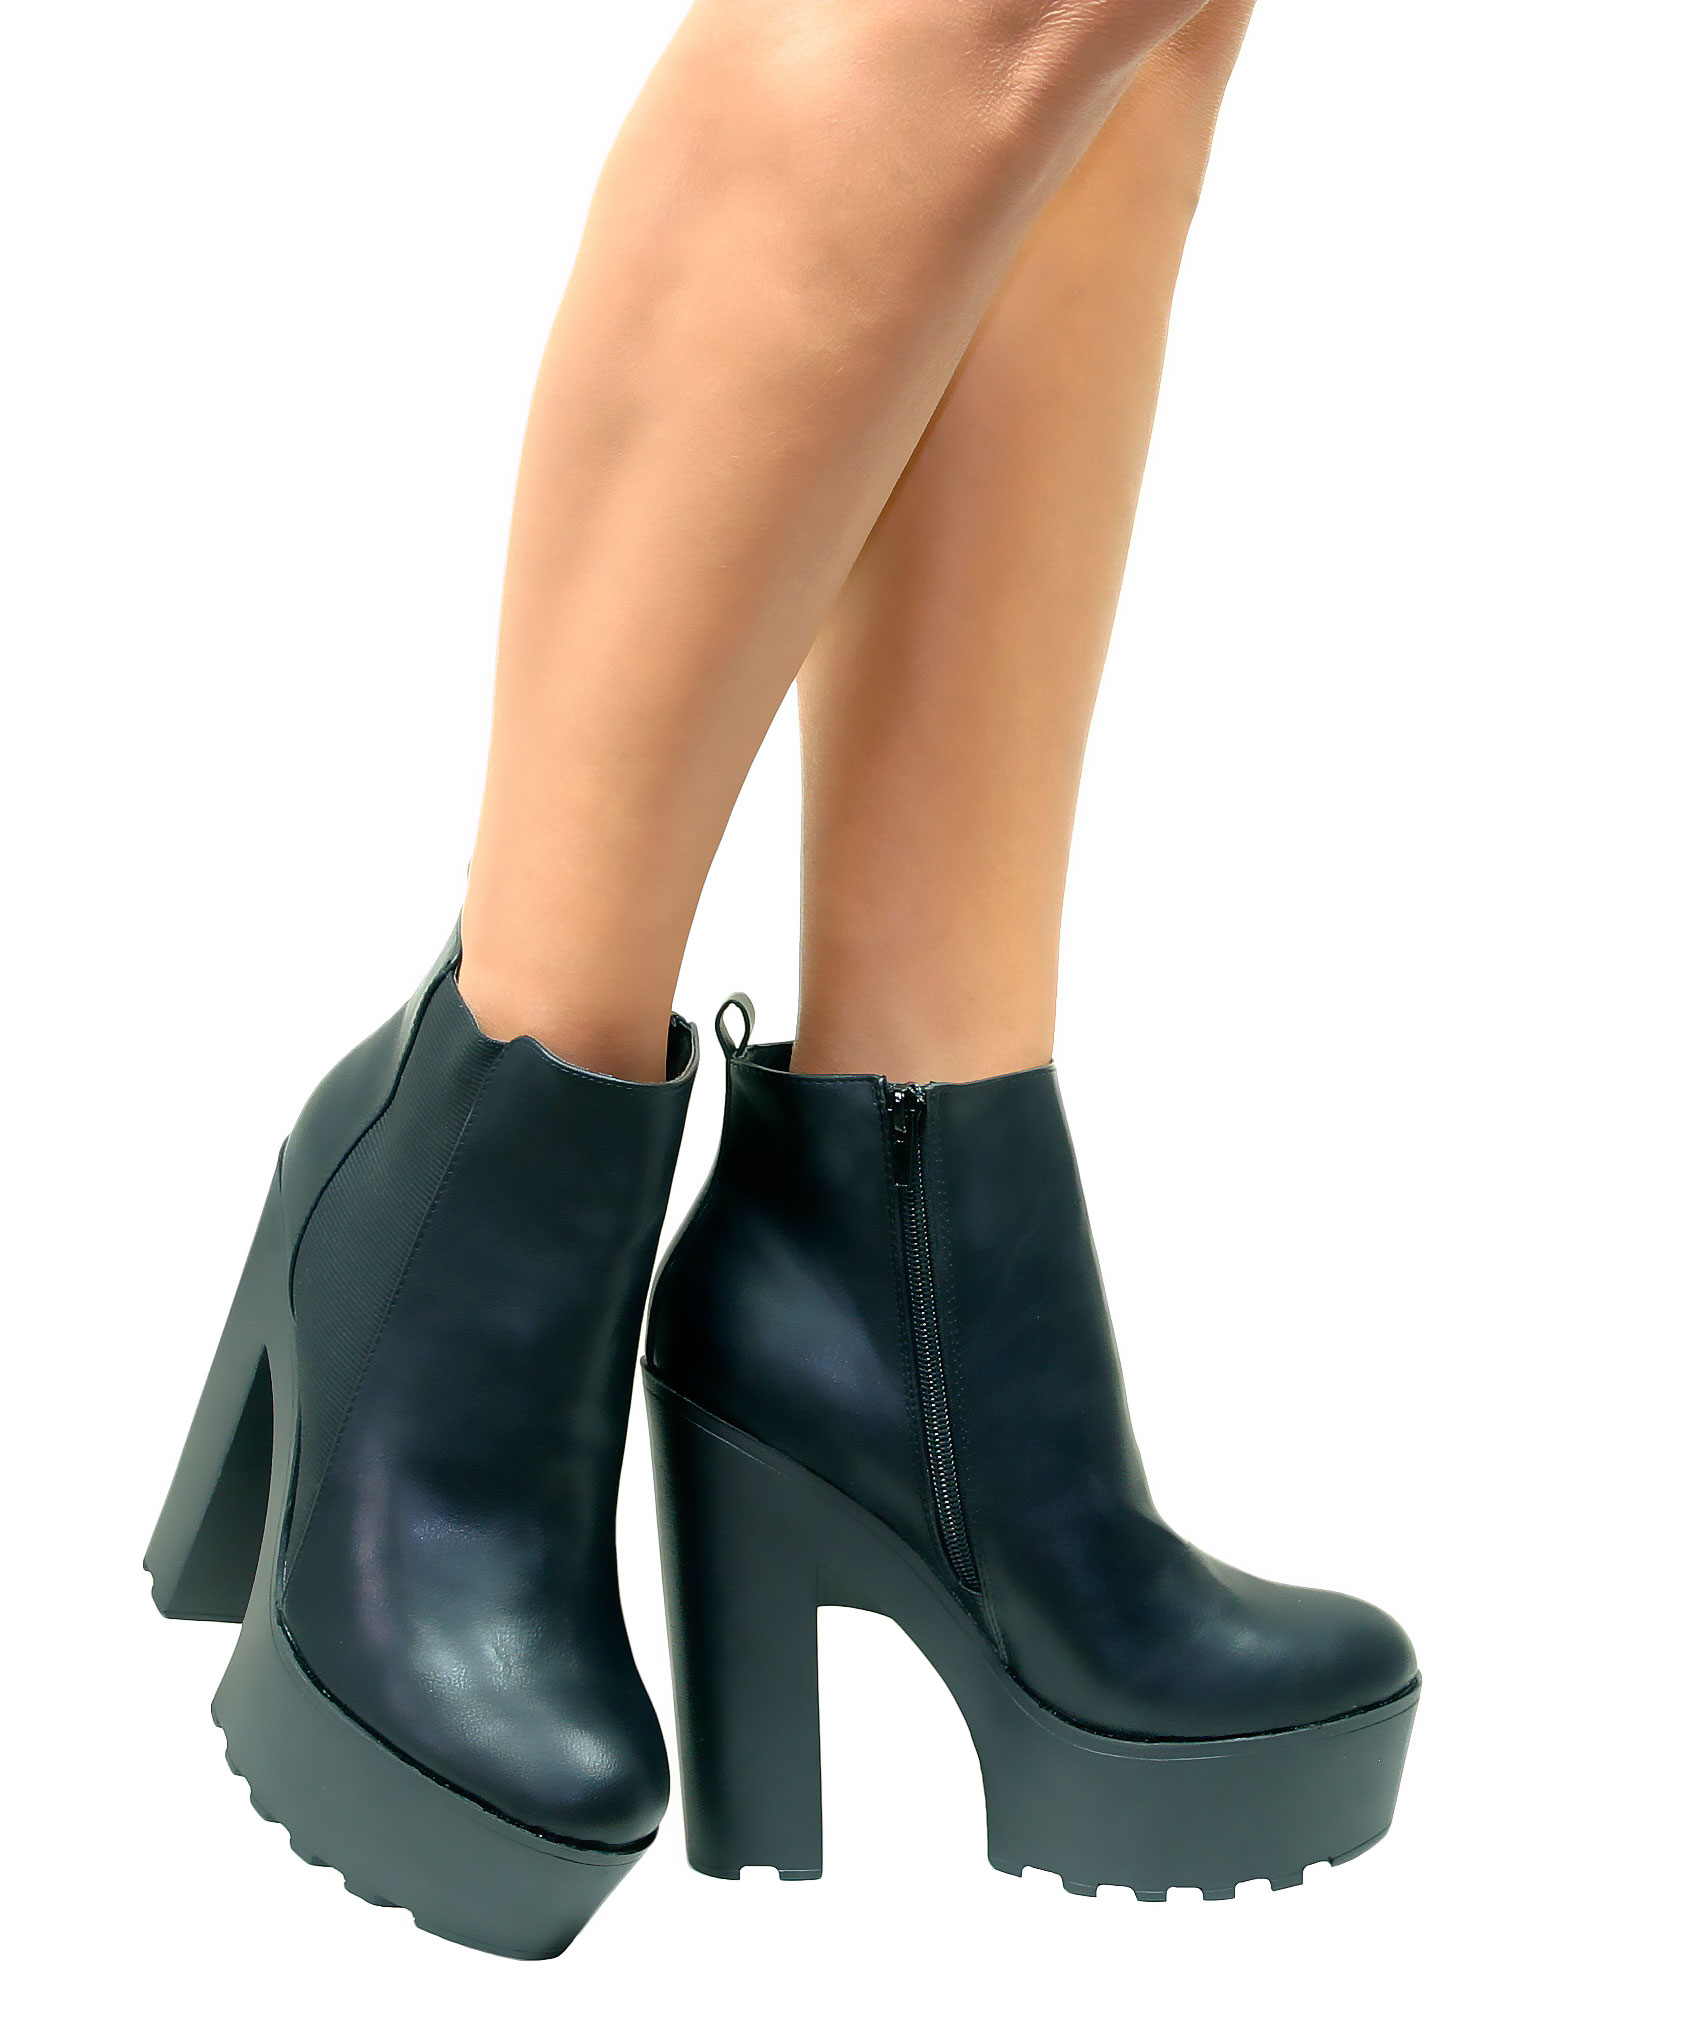 Chunky High Heel Platform